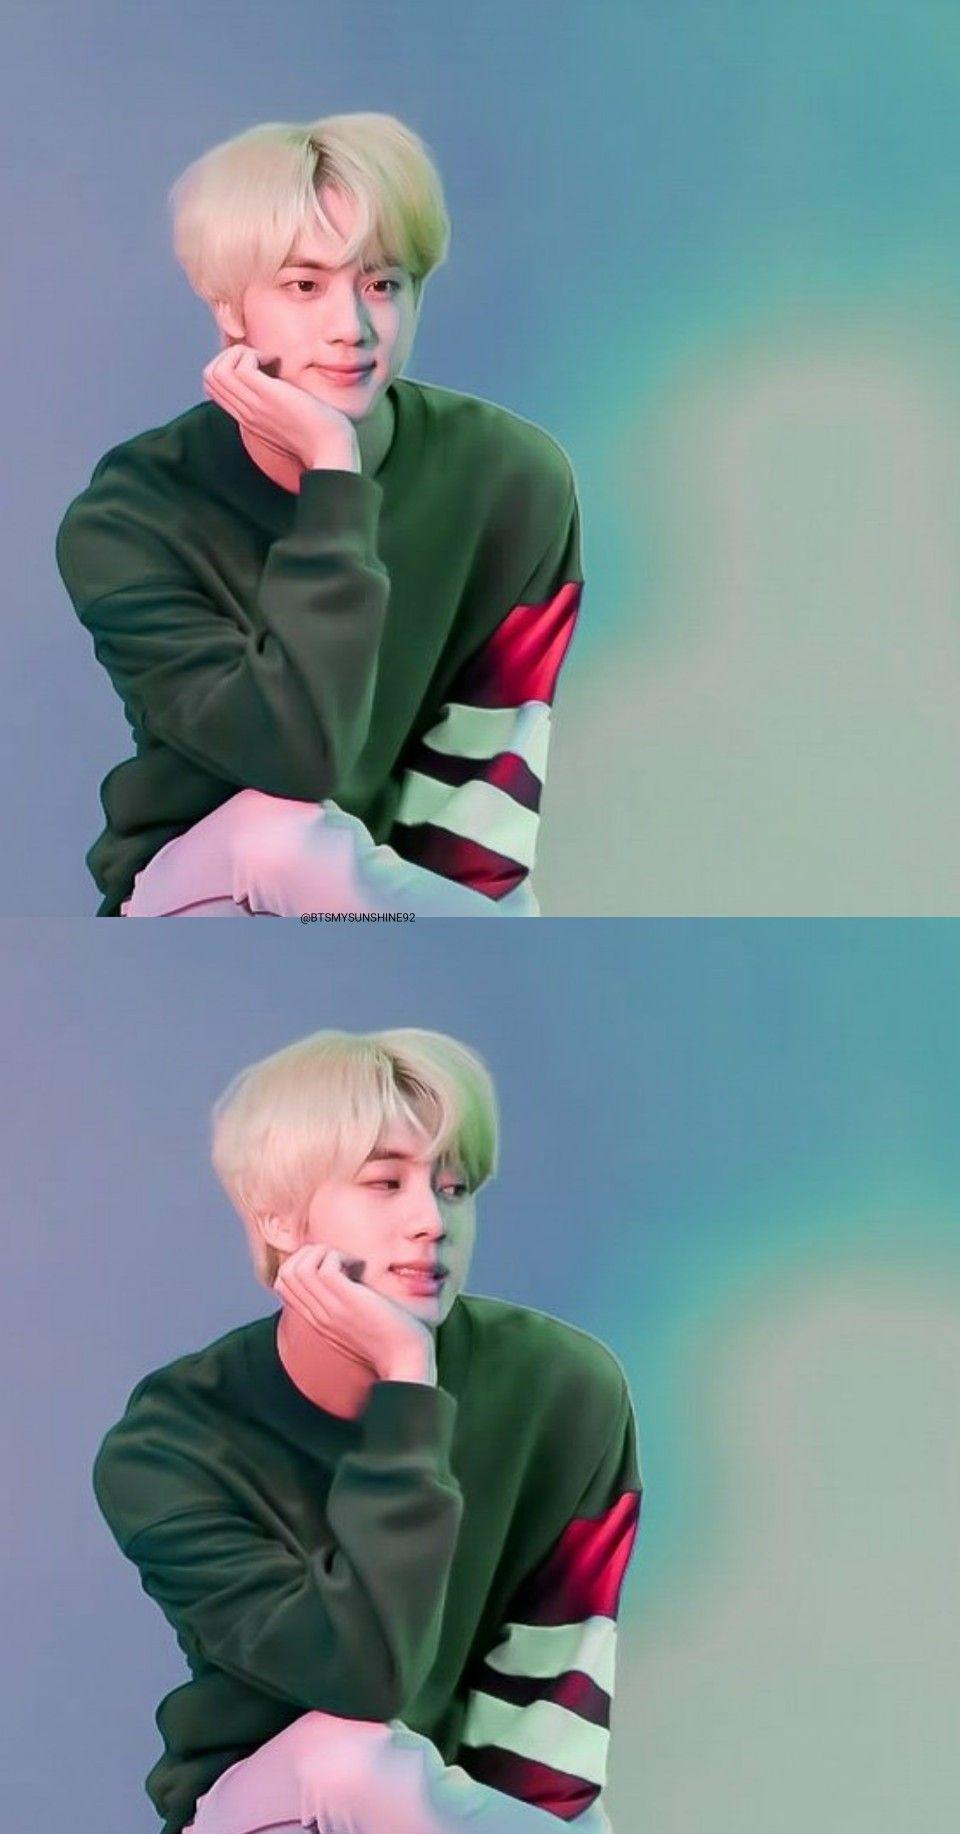 #JIN [EPISODE] BTS (방탄소년단) LOVE YOURSELF 結 'Answer' Jacket shooting sketch